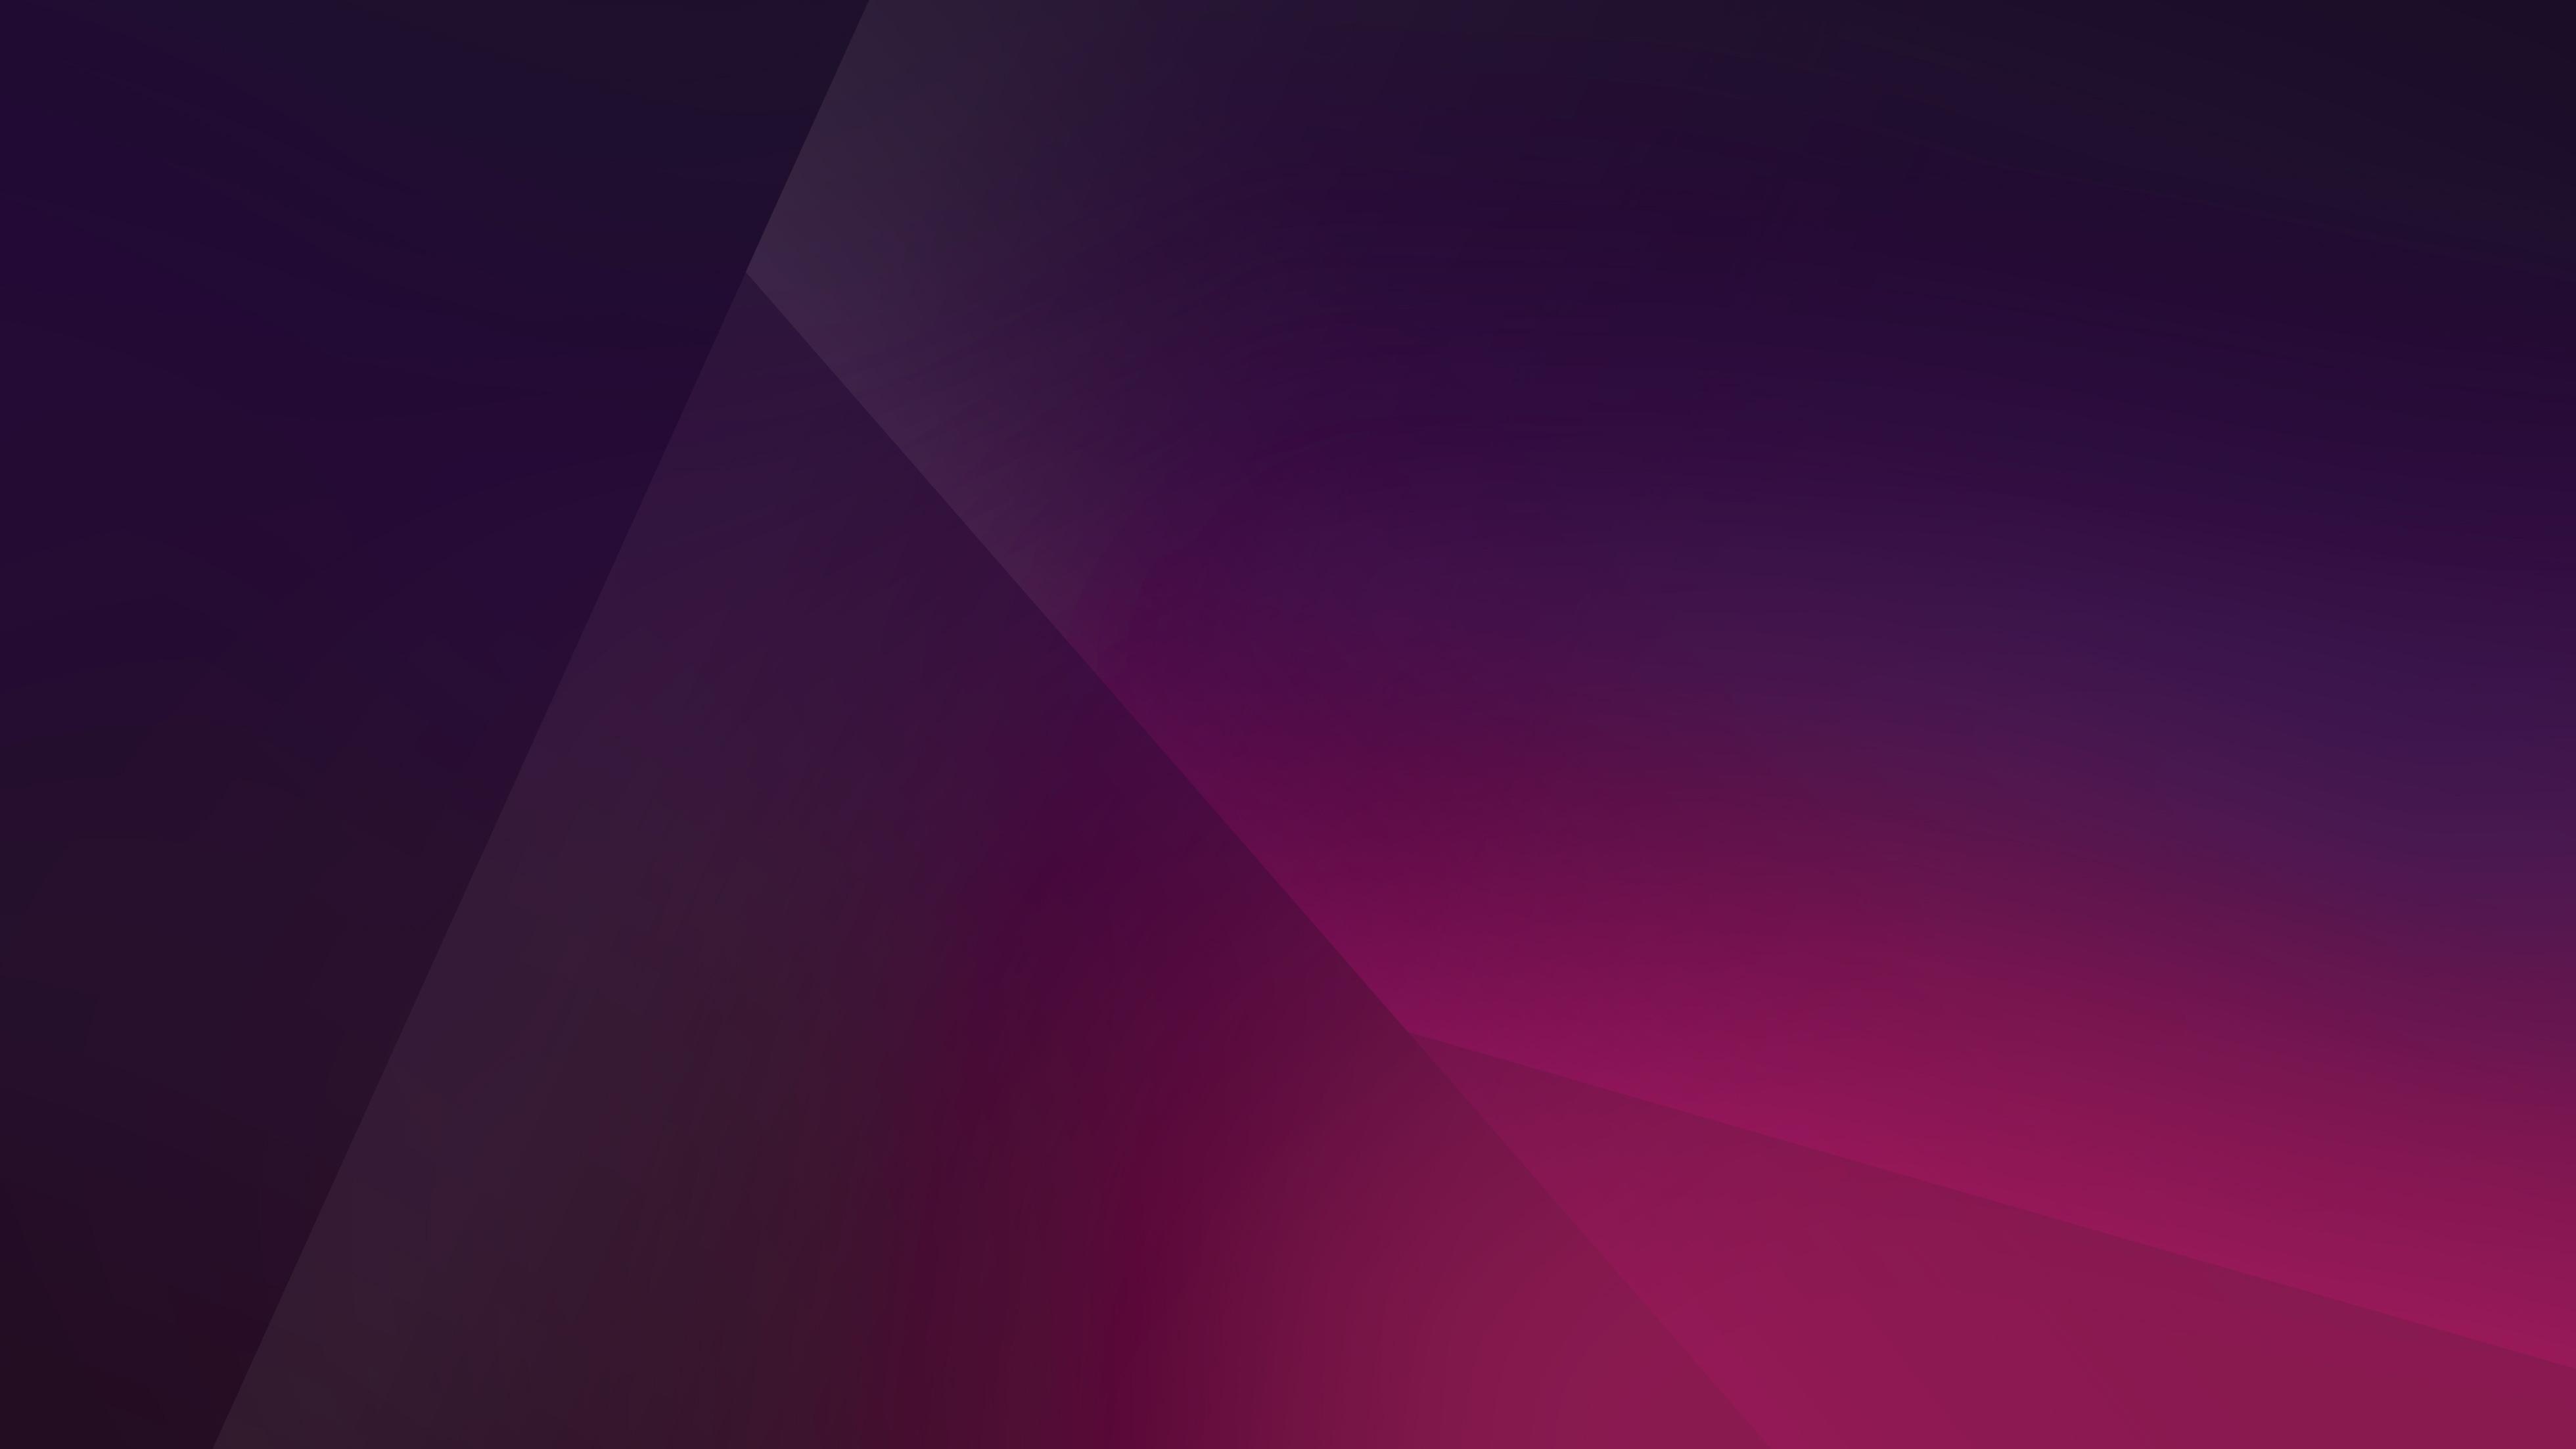 1680x1050 Purple Abstract Hd 4k 1680x1050 Resolution Hd 4k